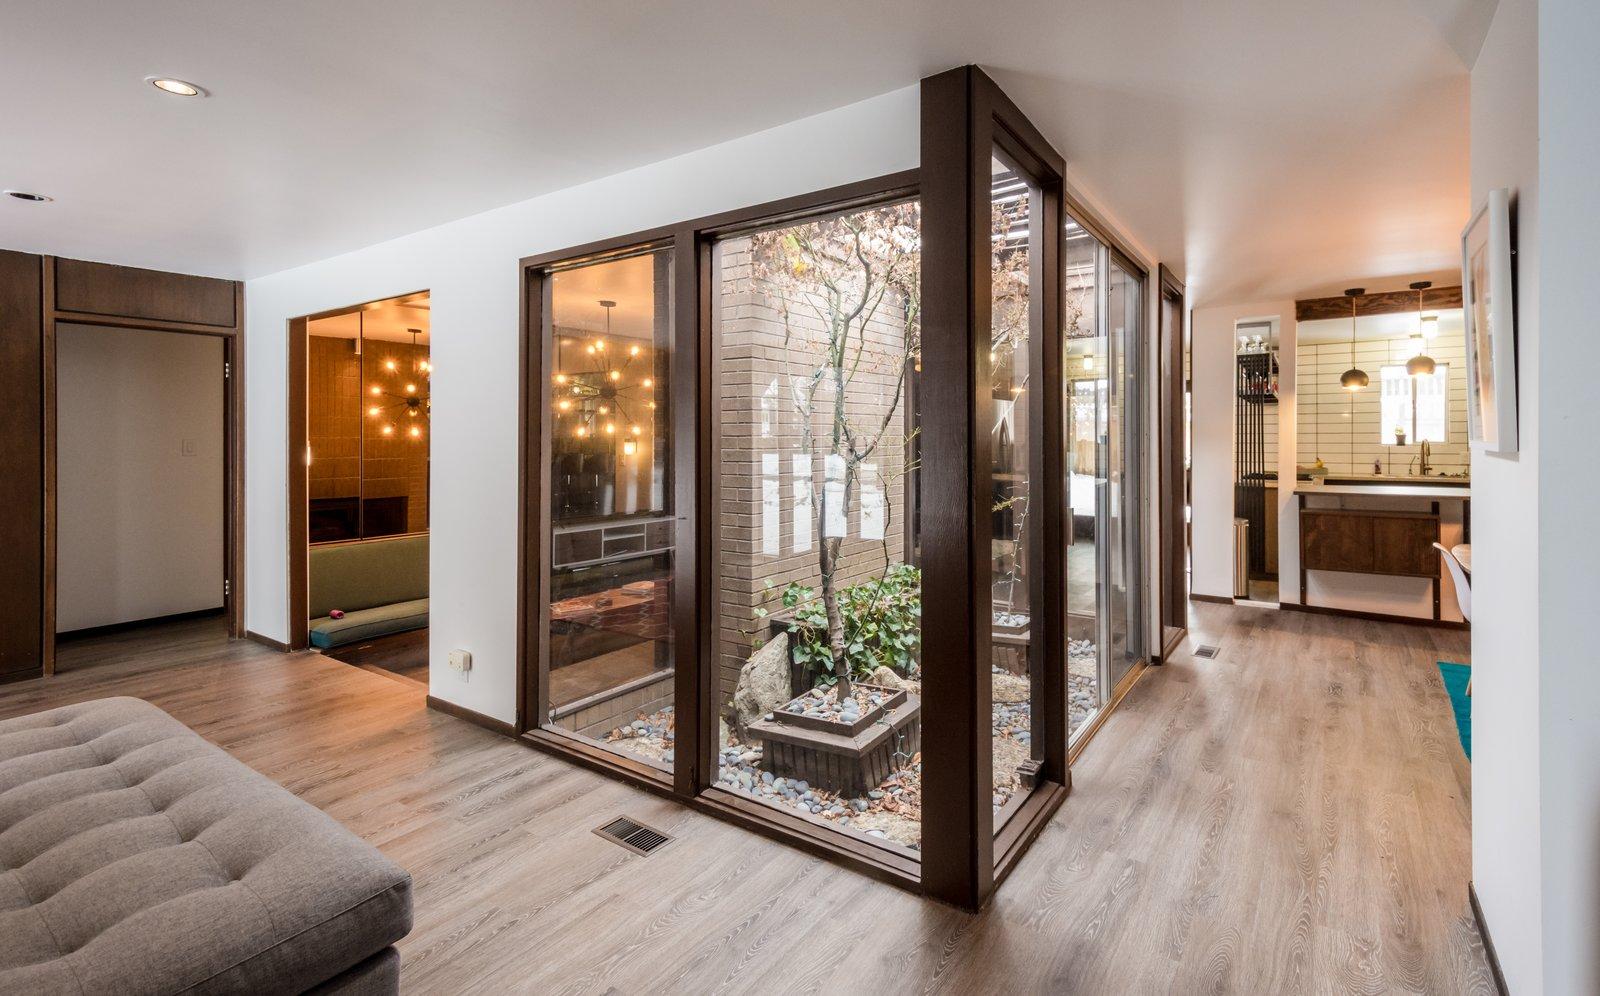 Entry of home showcasing the original atrium new flooring and open floor plan  Ron Molen Revival